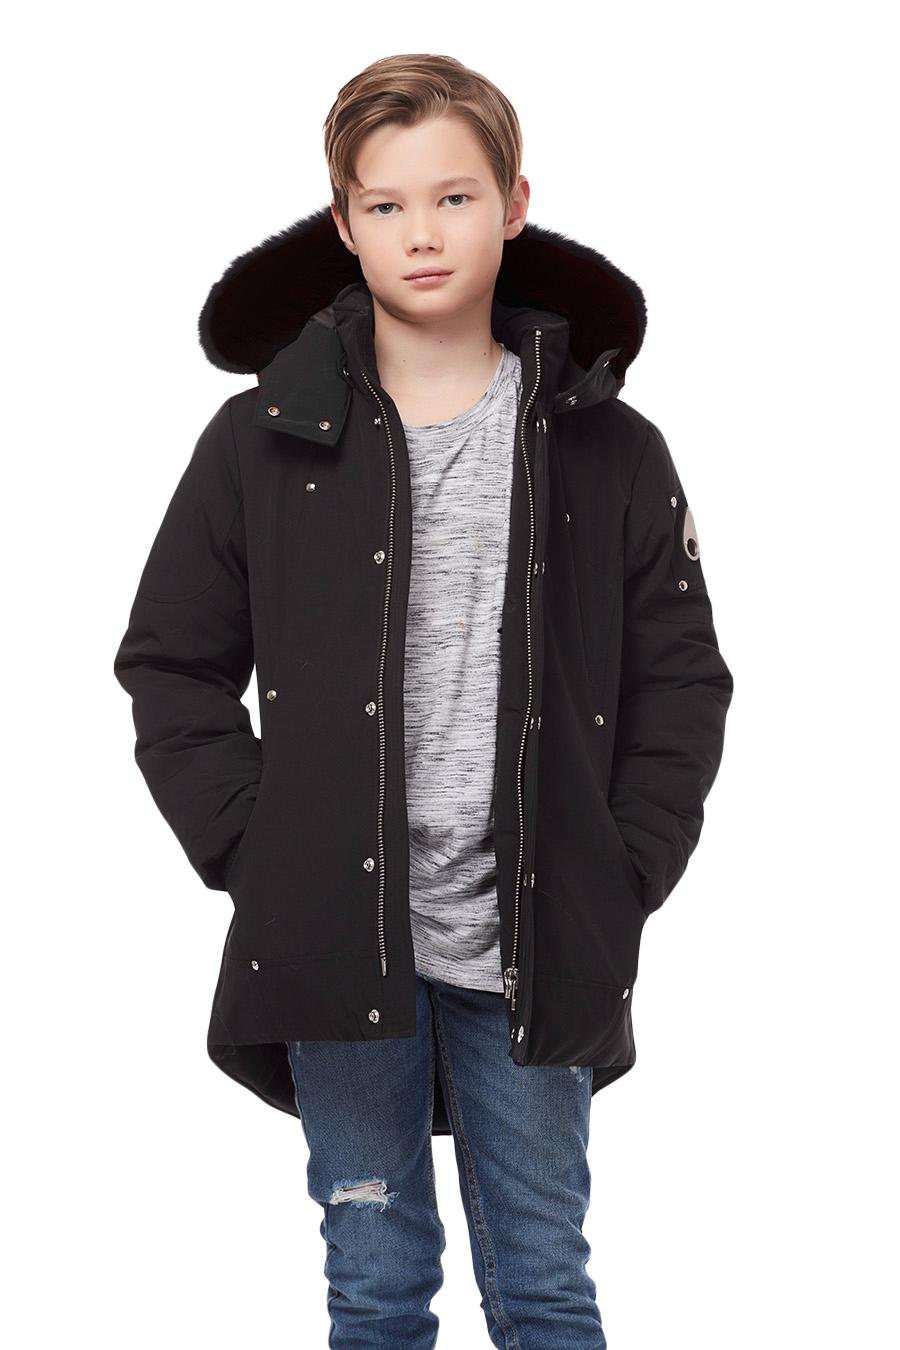 Moose Knuckles Parka Kid's Jacket